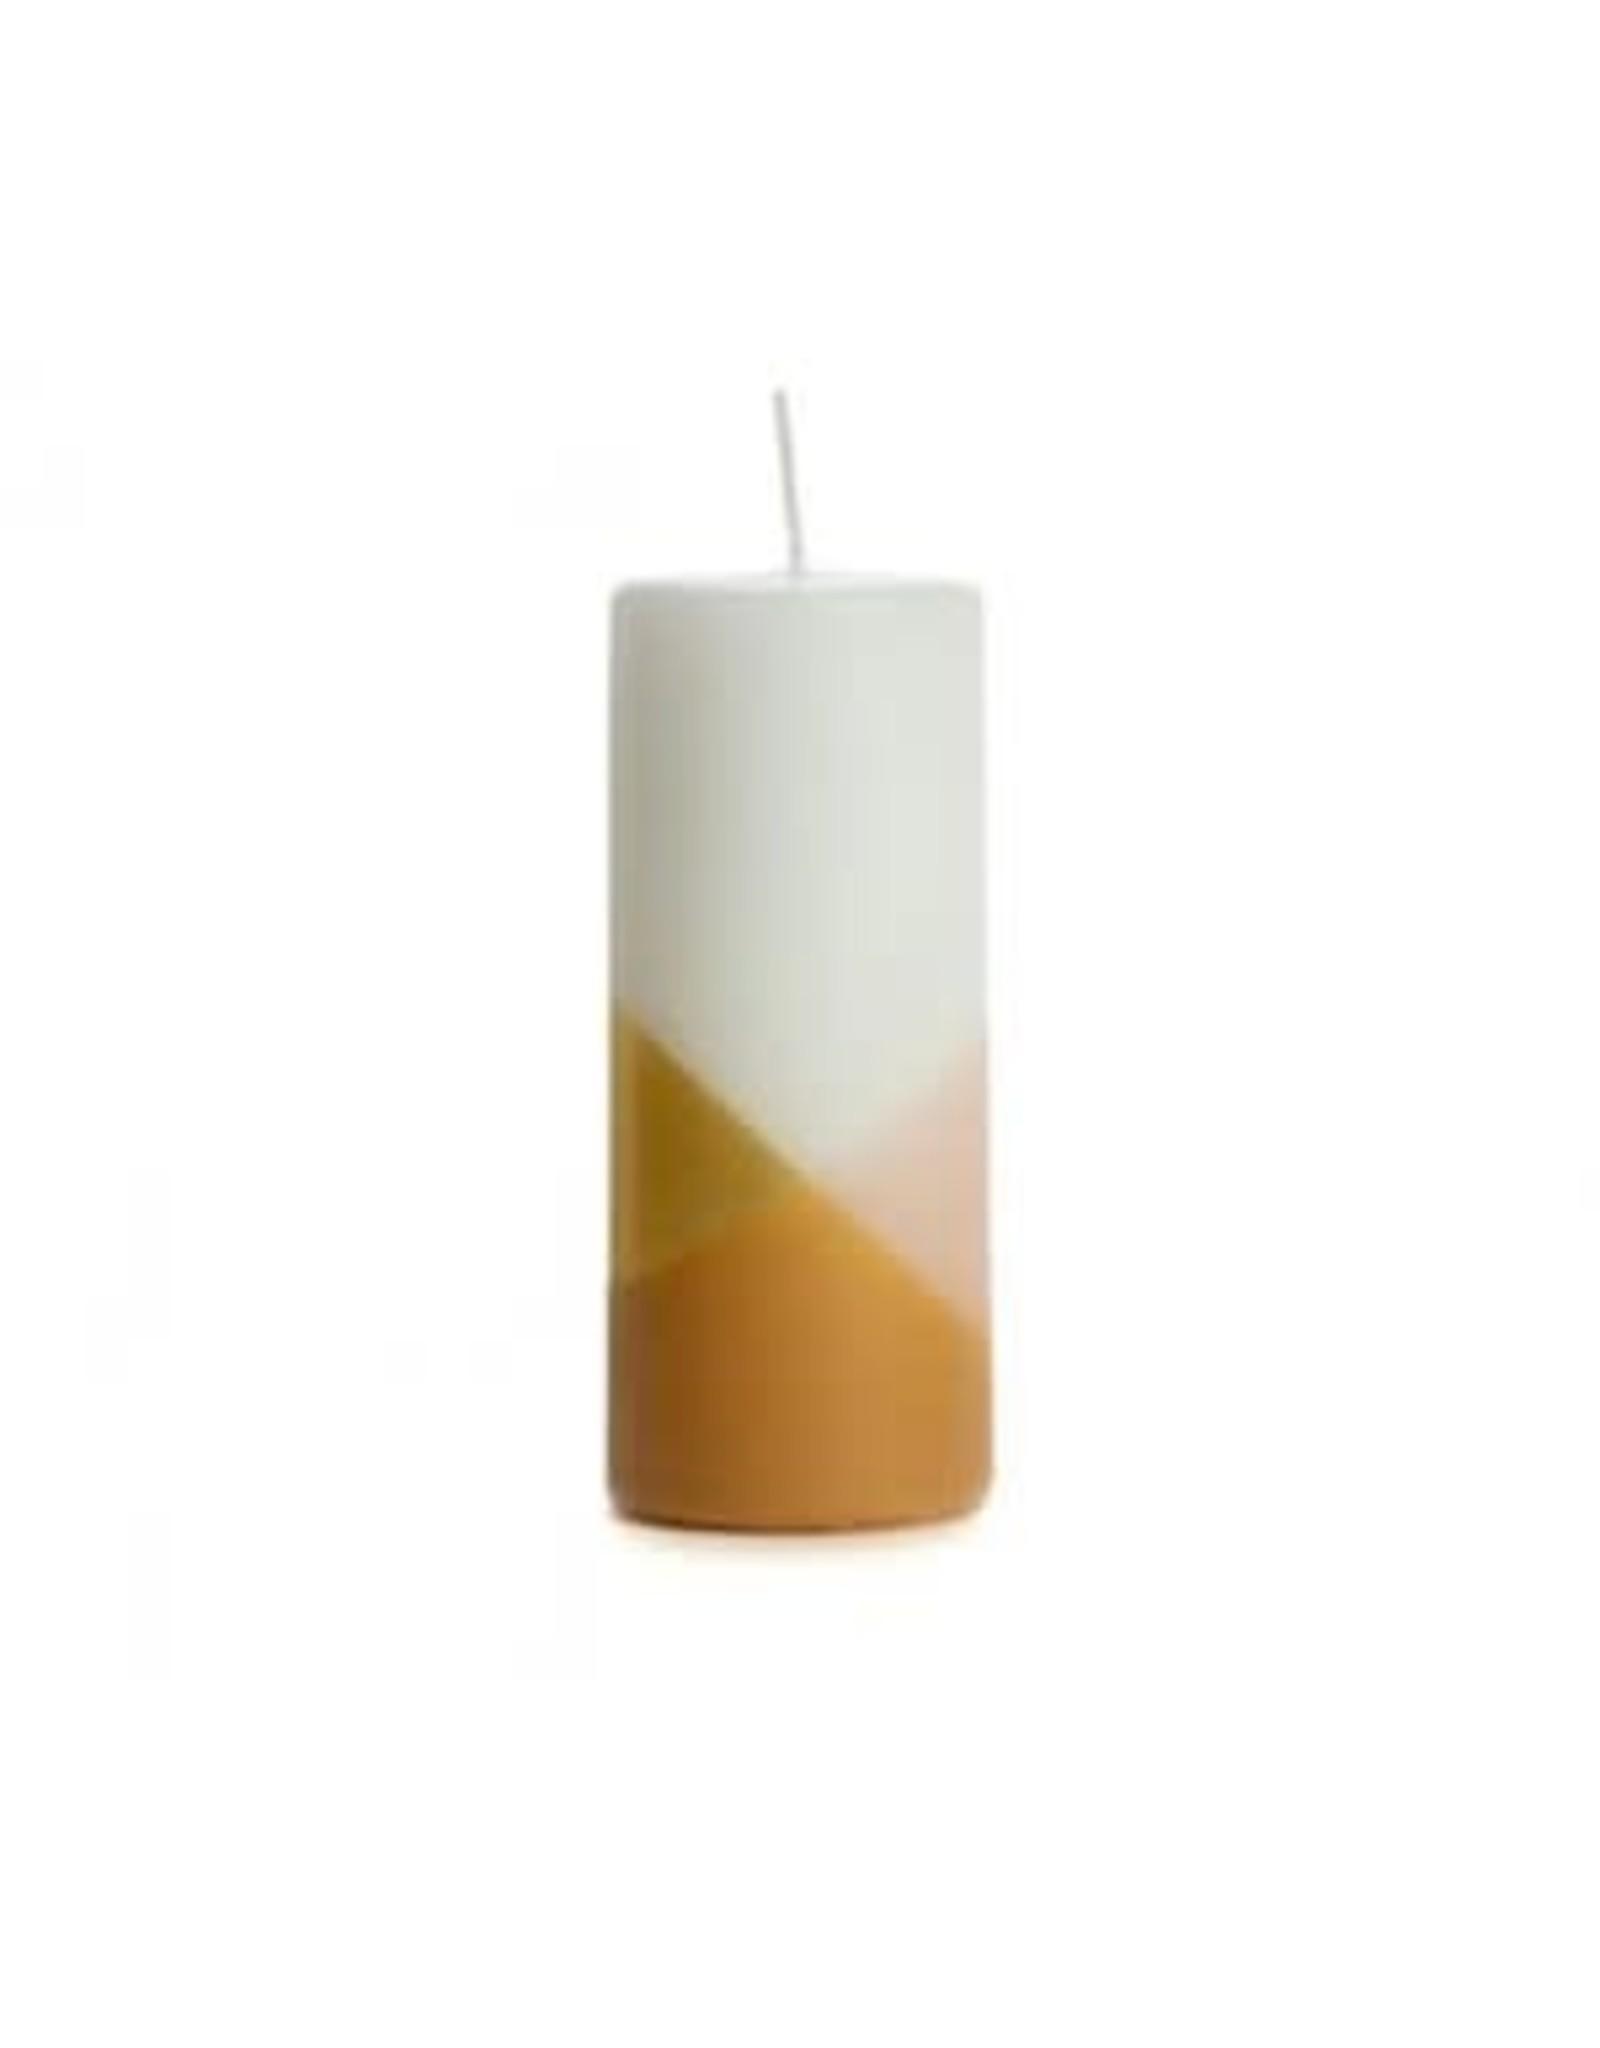 Rustik Lys Kaars - Blokkaars Cross  - Blossom  - Ø 6 x 15 cm - Brandtijd +/- 54u